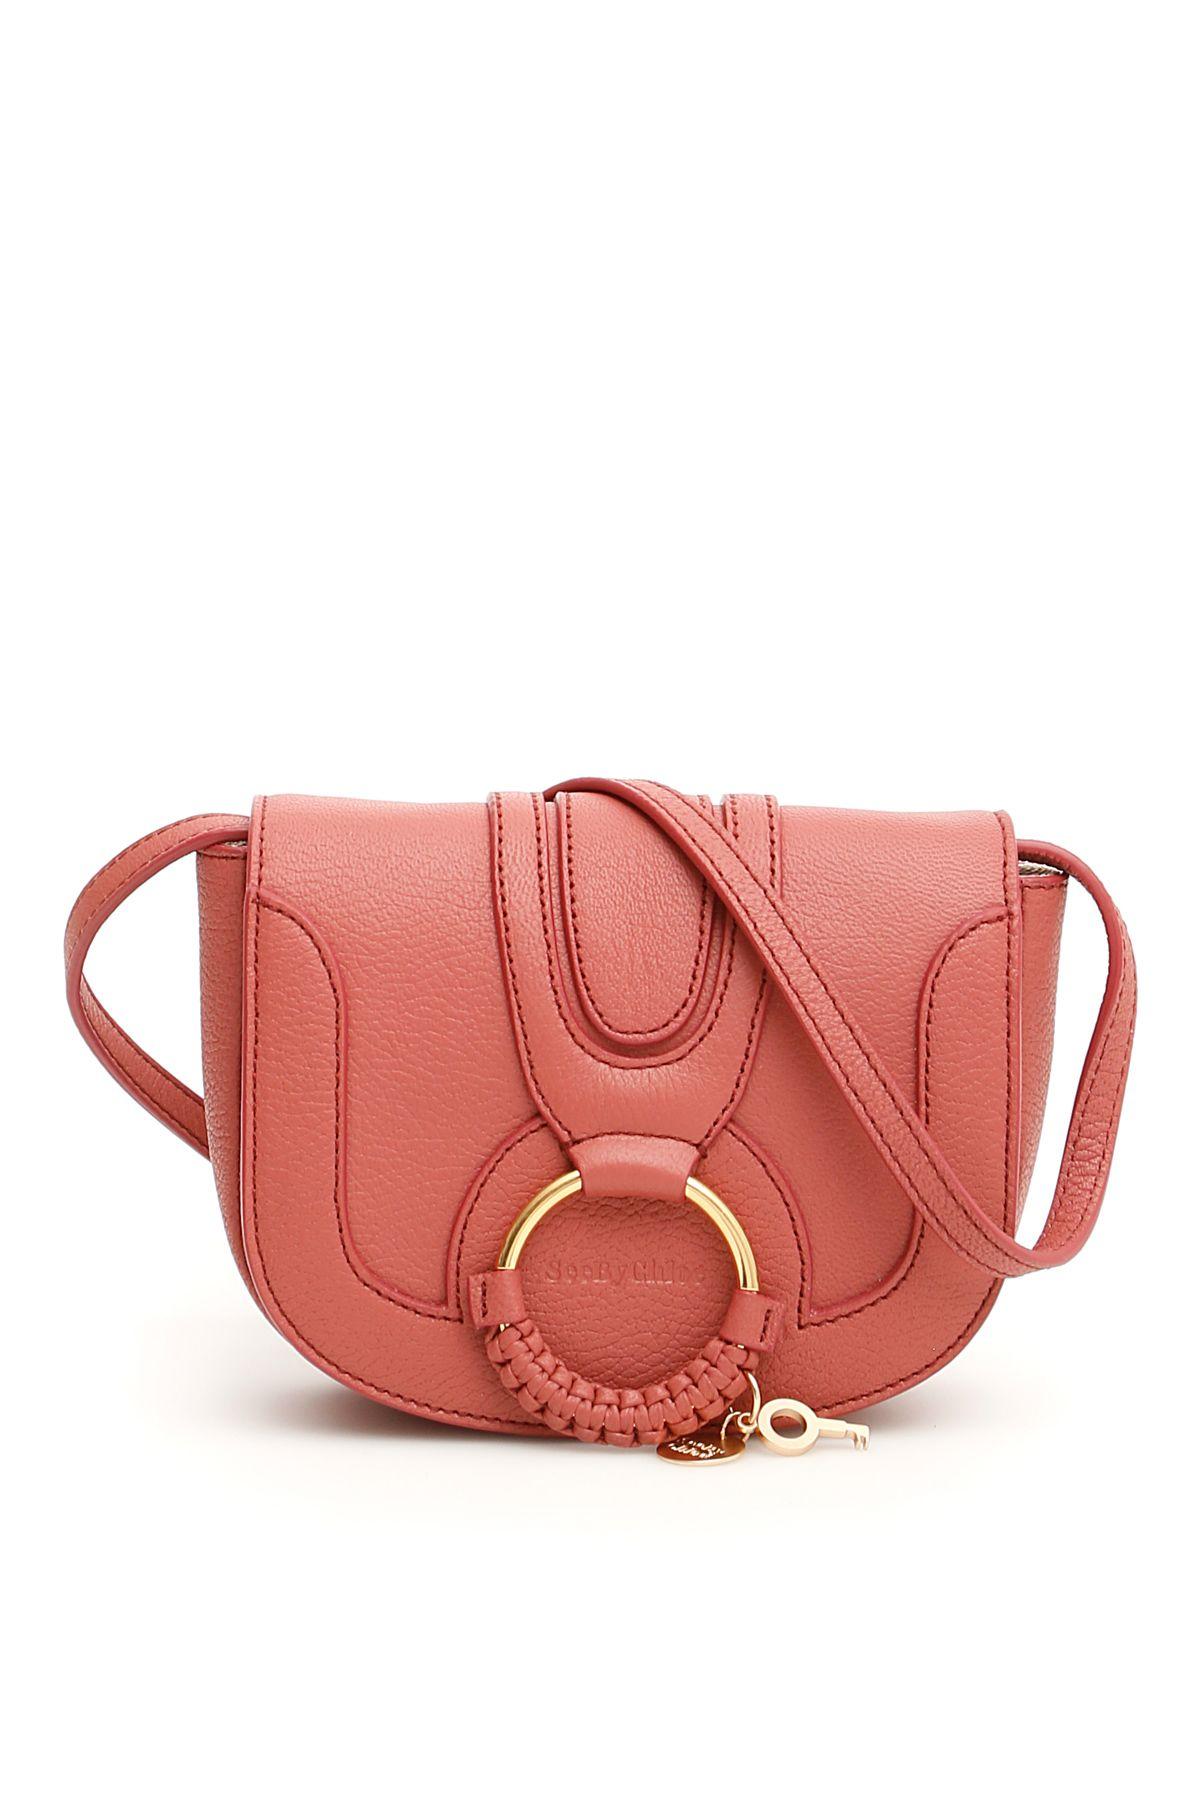 6299726a See by Chloé Mini Hana Shoulder Bag